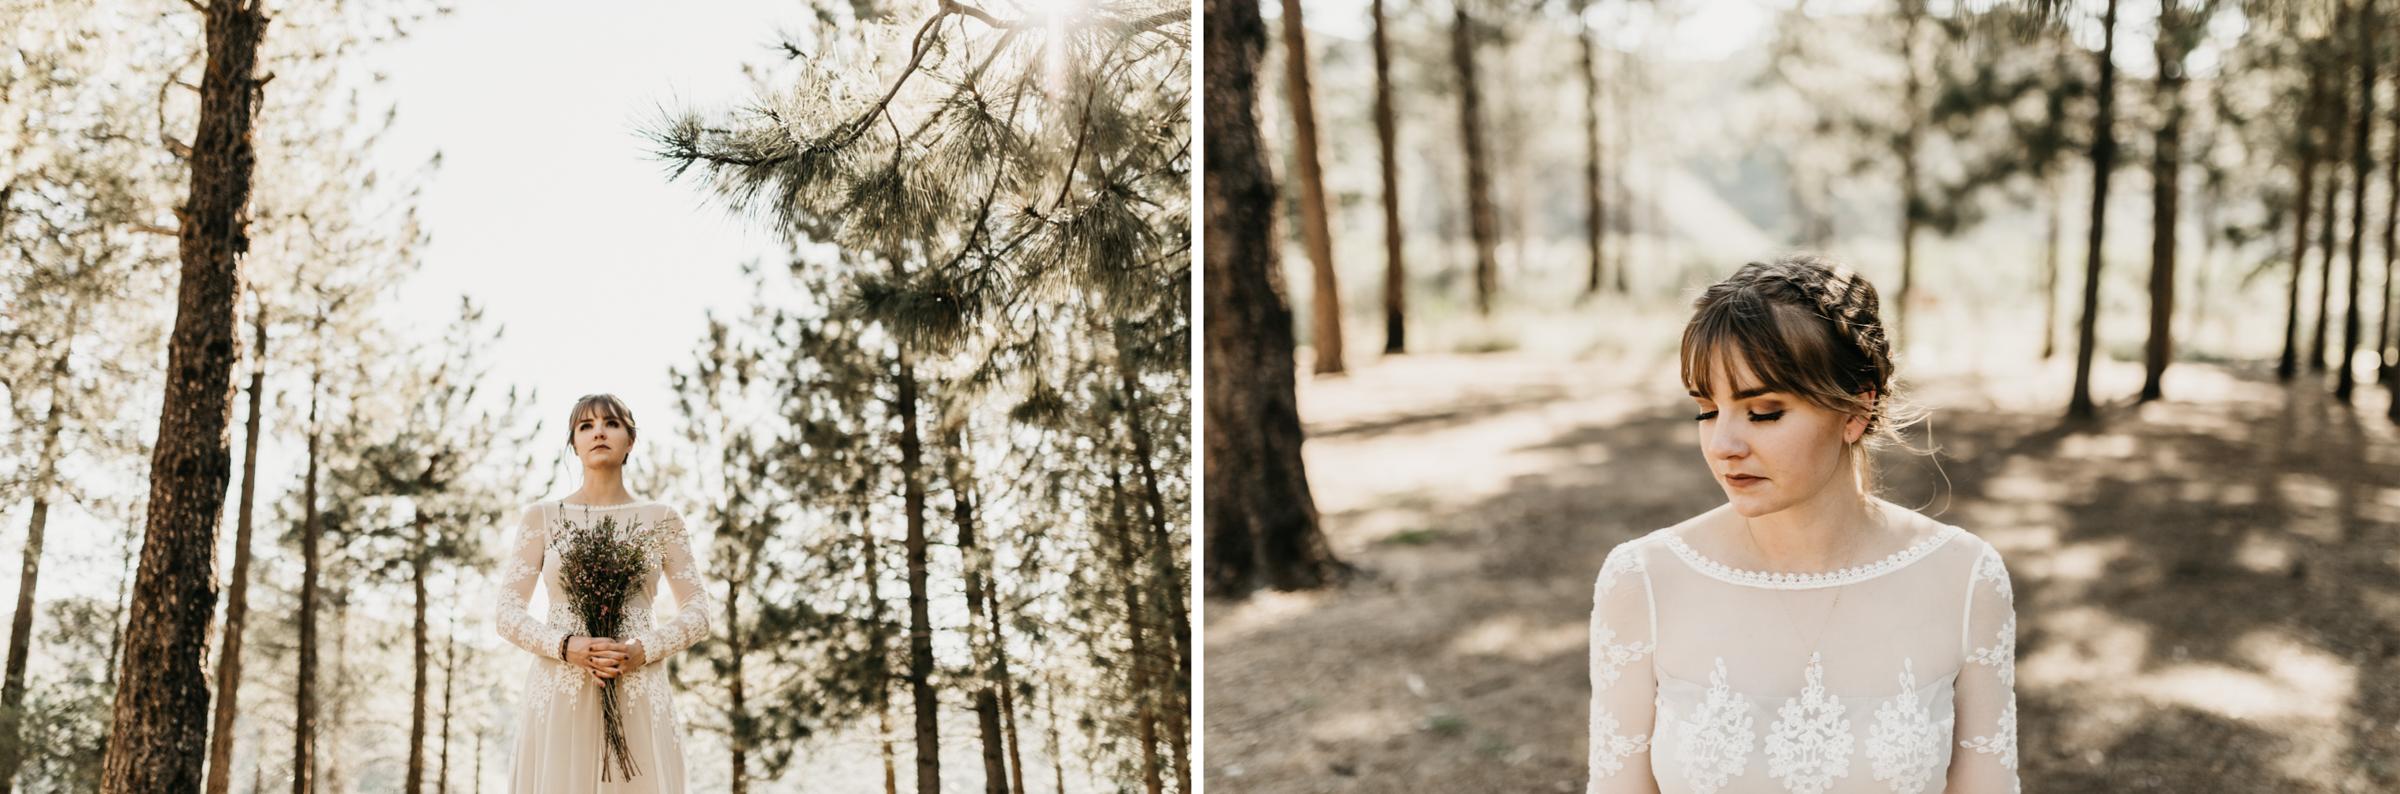 ©Isaiah + Taylor Photography - Los Angeles Wedding Photographers - Los Angeles Forest Wedding -5.jpg